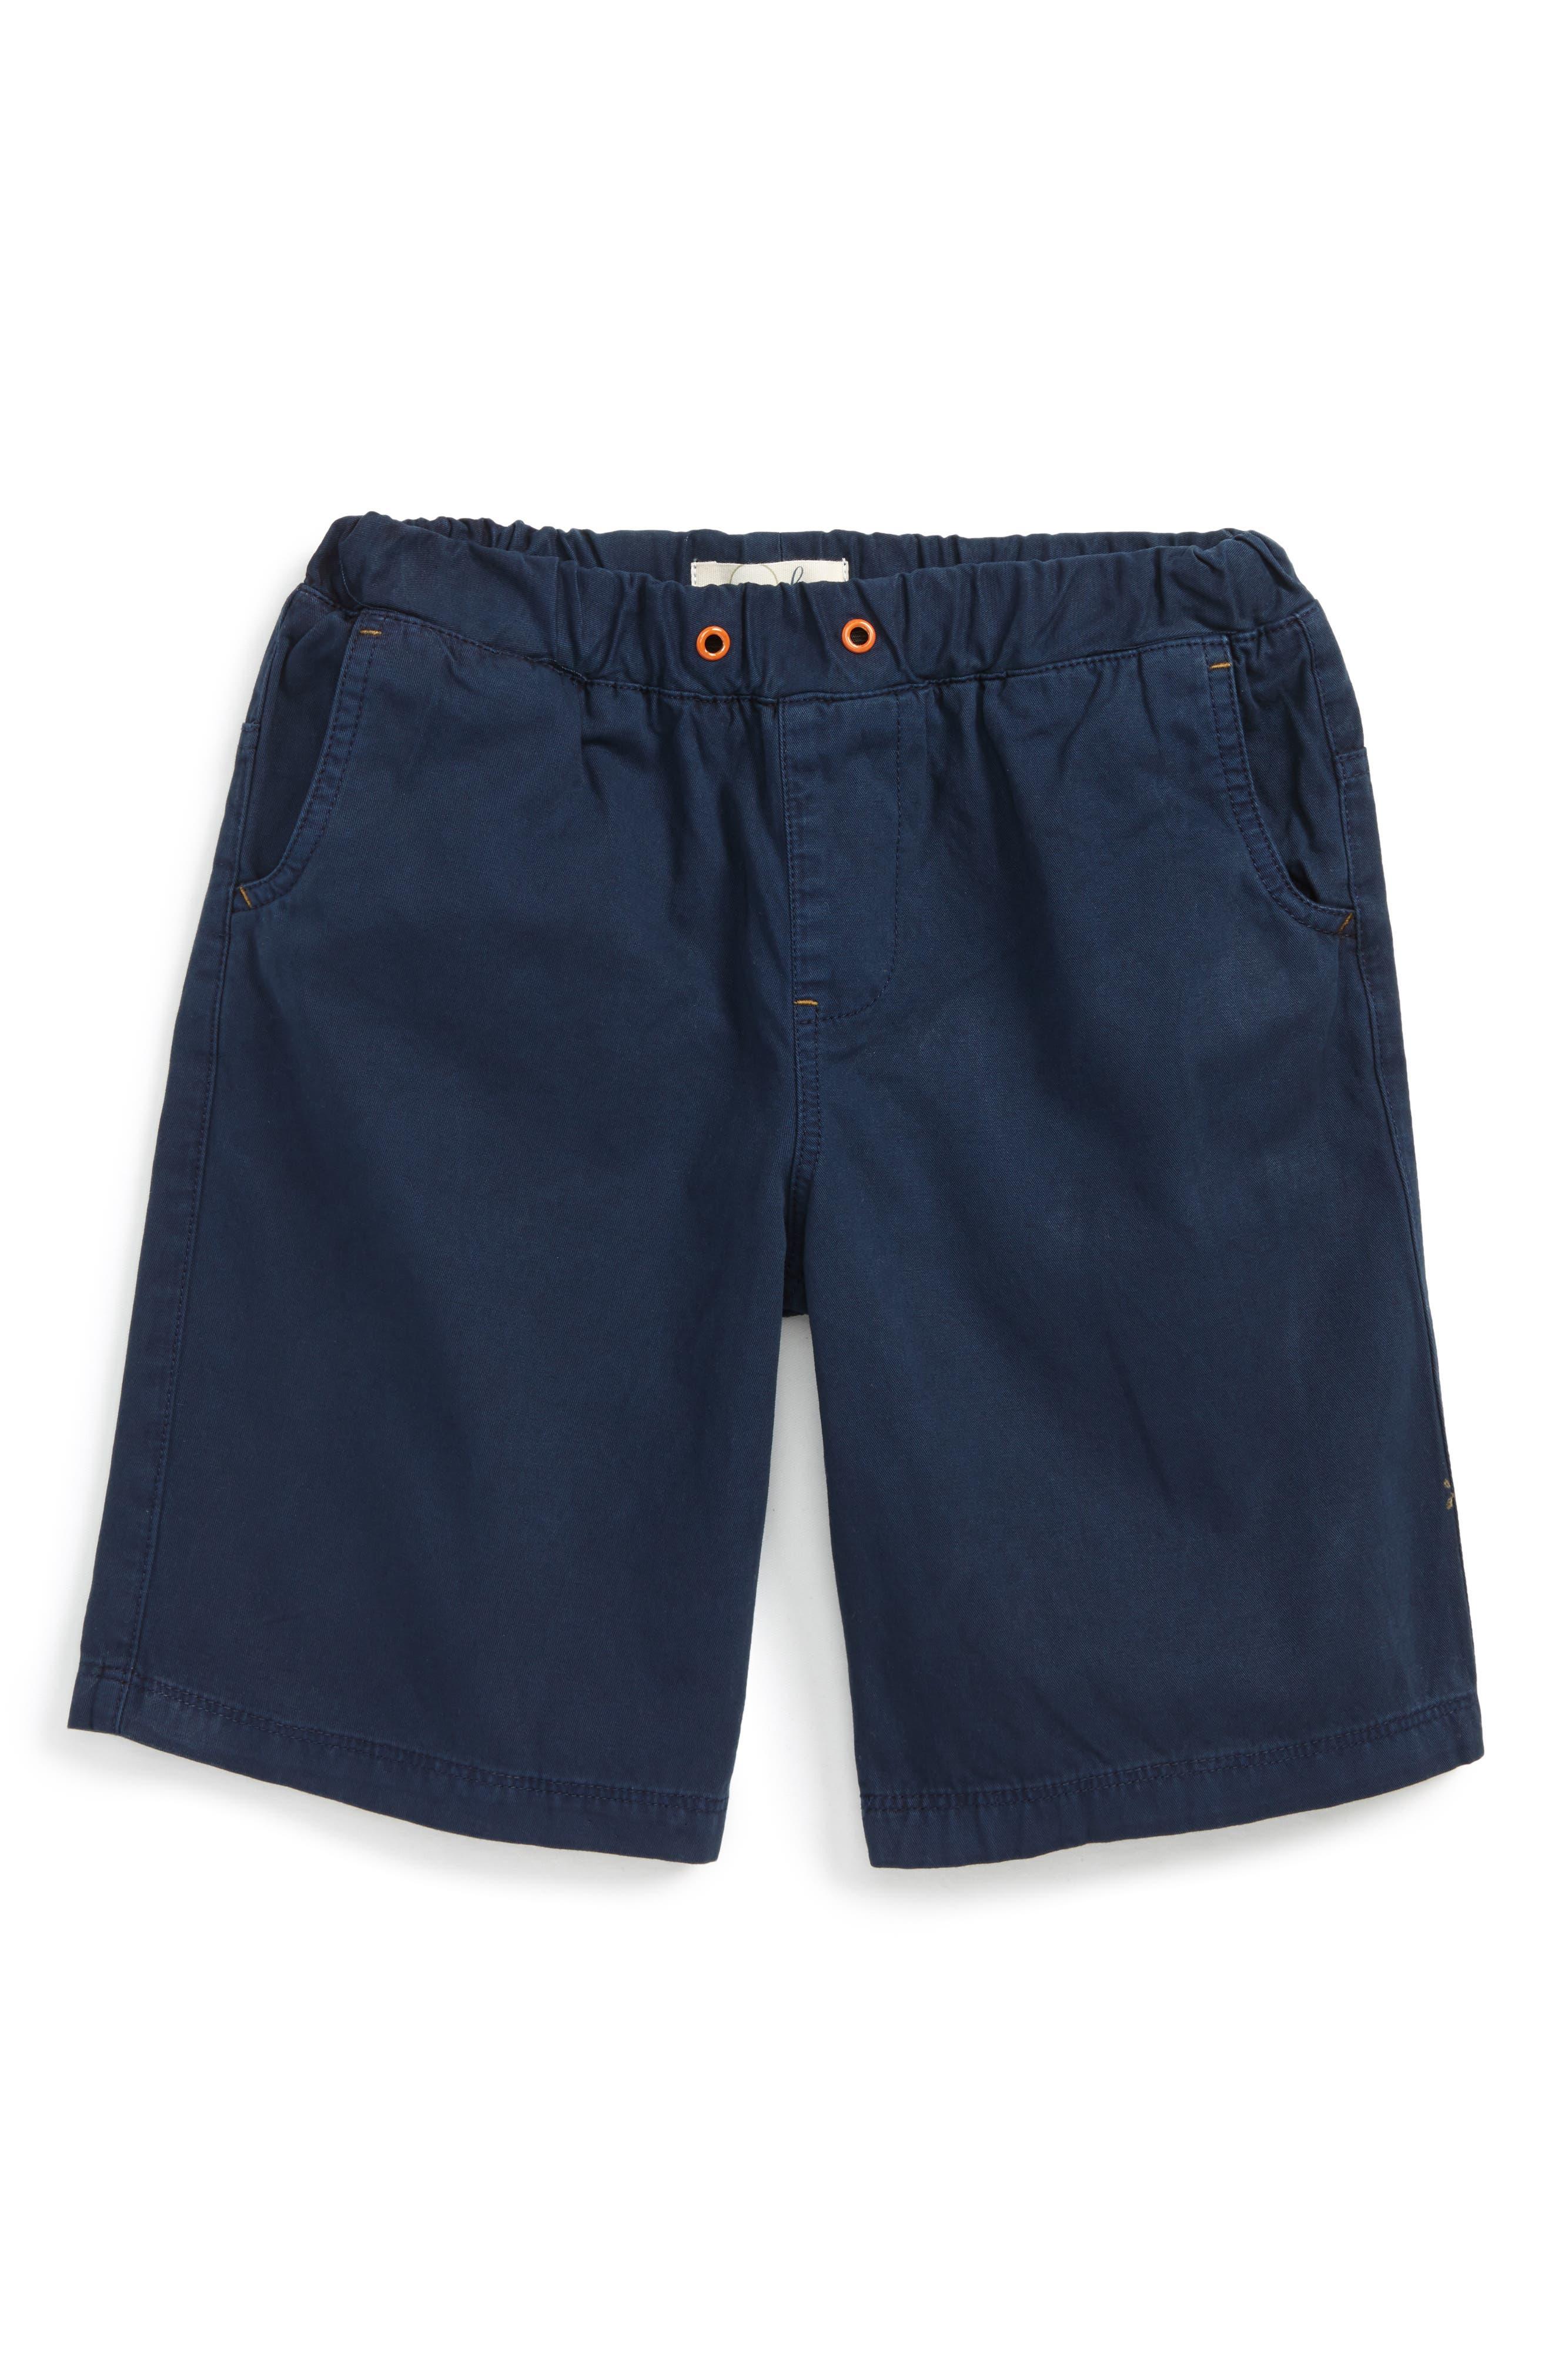 Main Image - Peek Morgan Shorts (Toddler Boys, Little Boys & Big Boys)